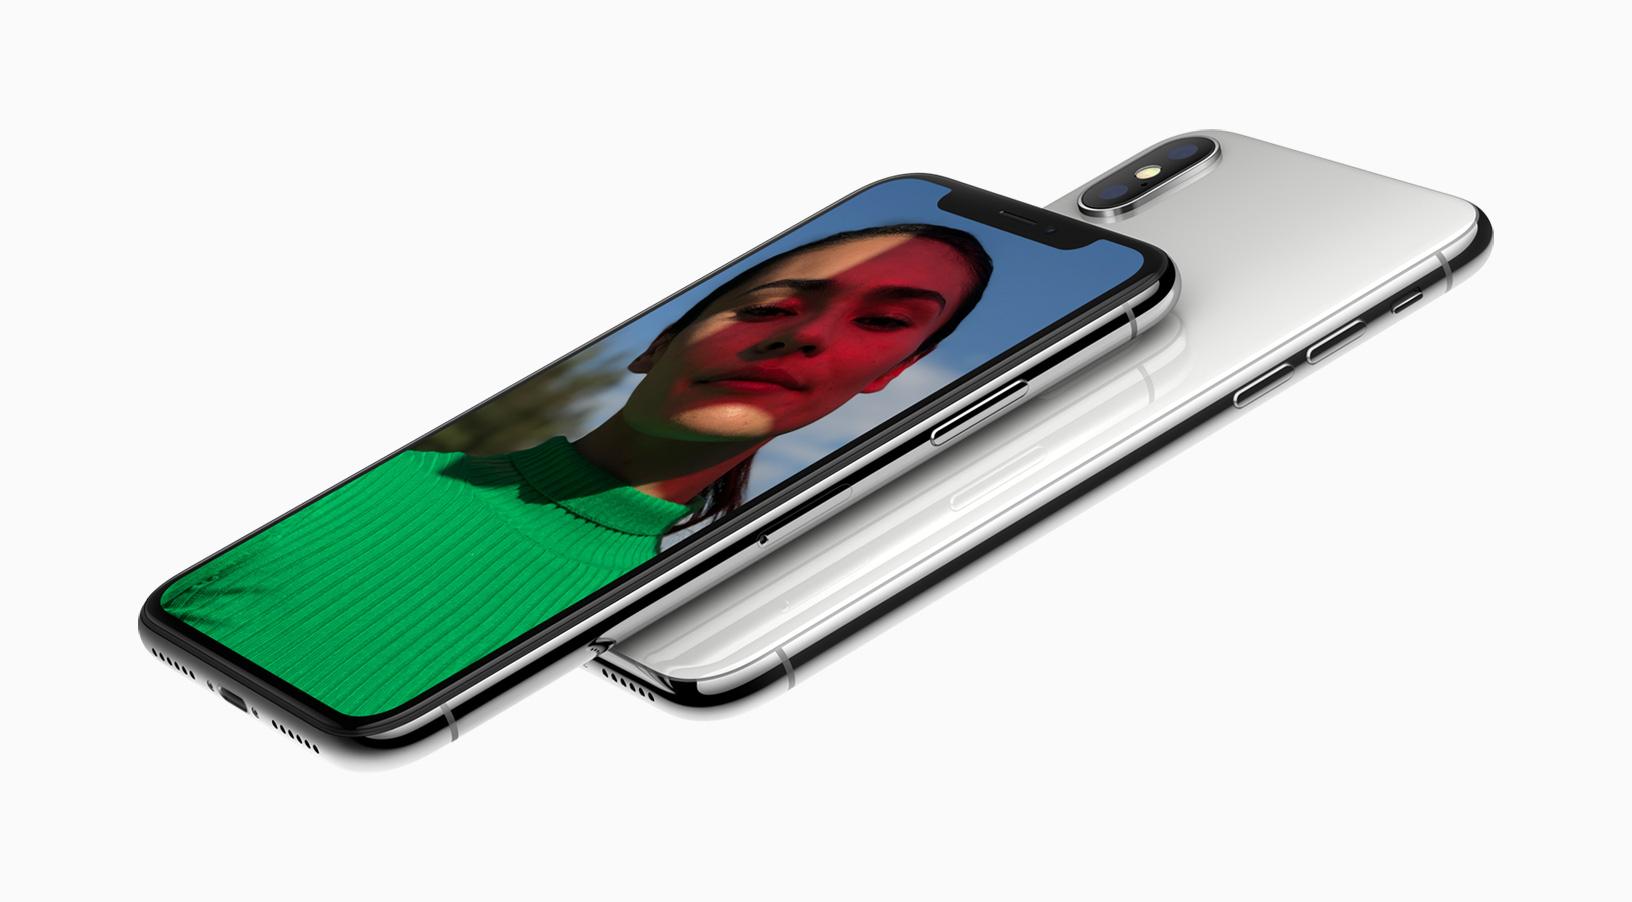 The Apple iPhone X